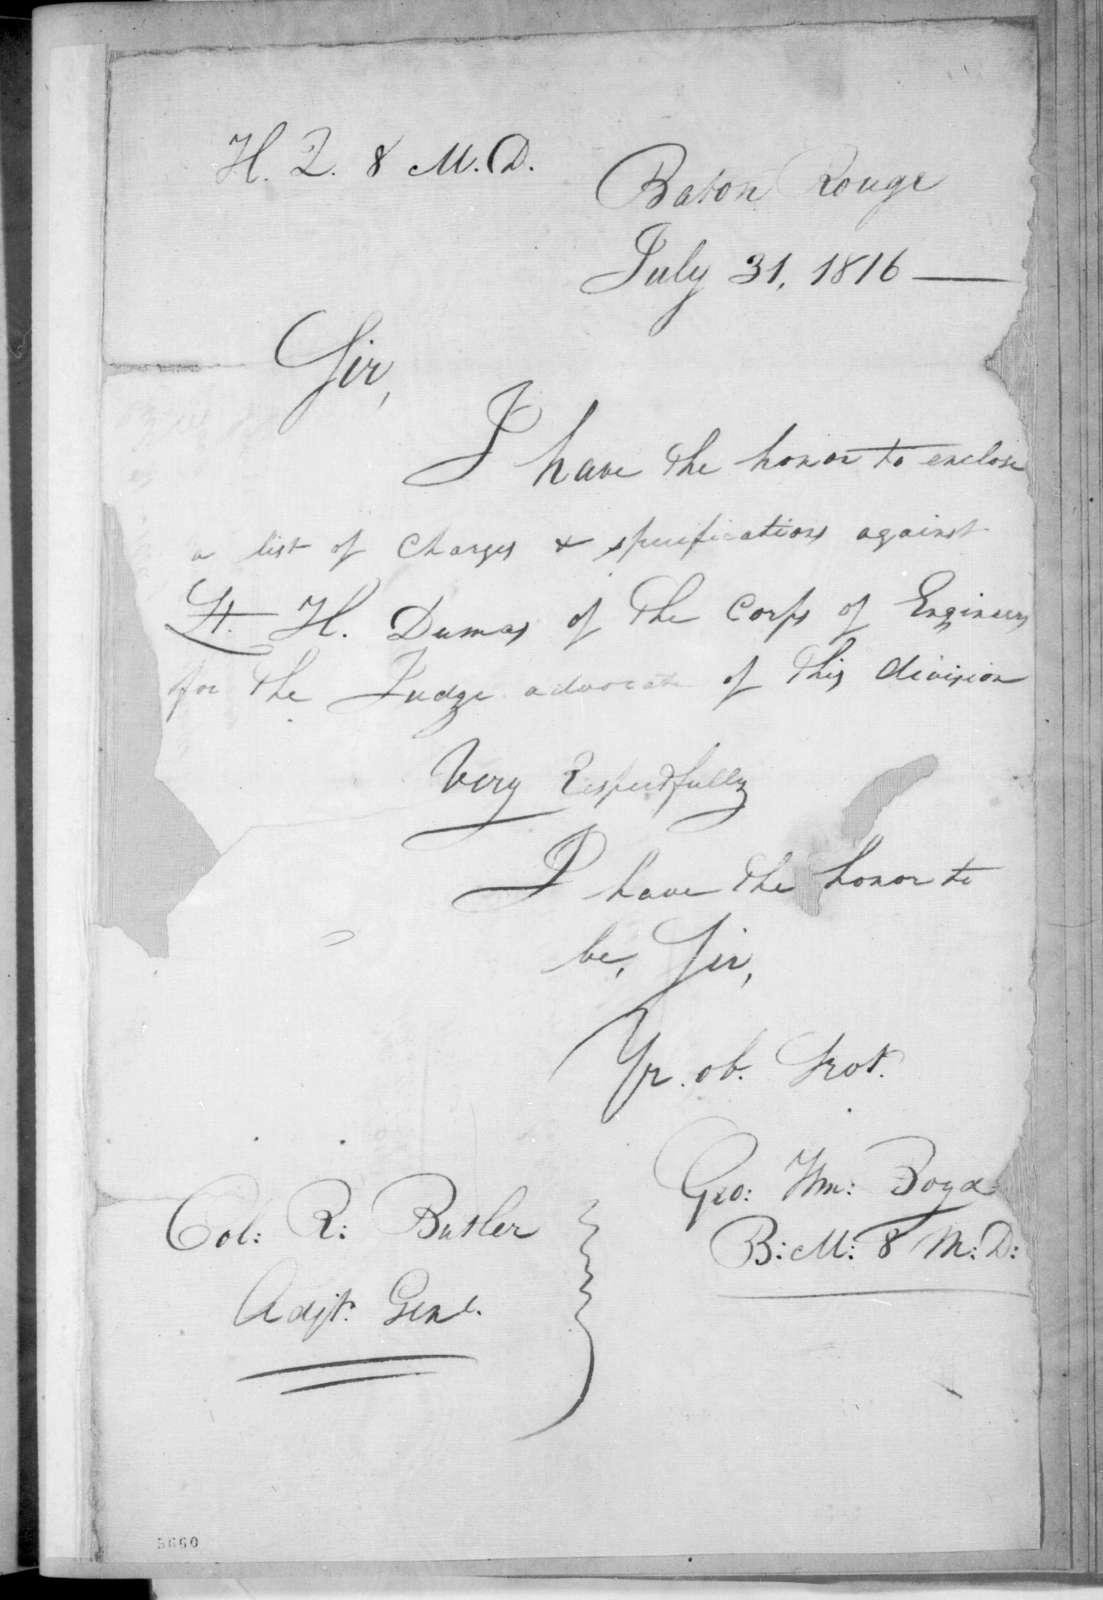 George W. Boyd to Robert Butler, July 31, 1816